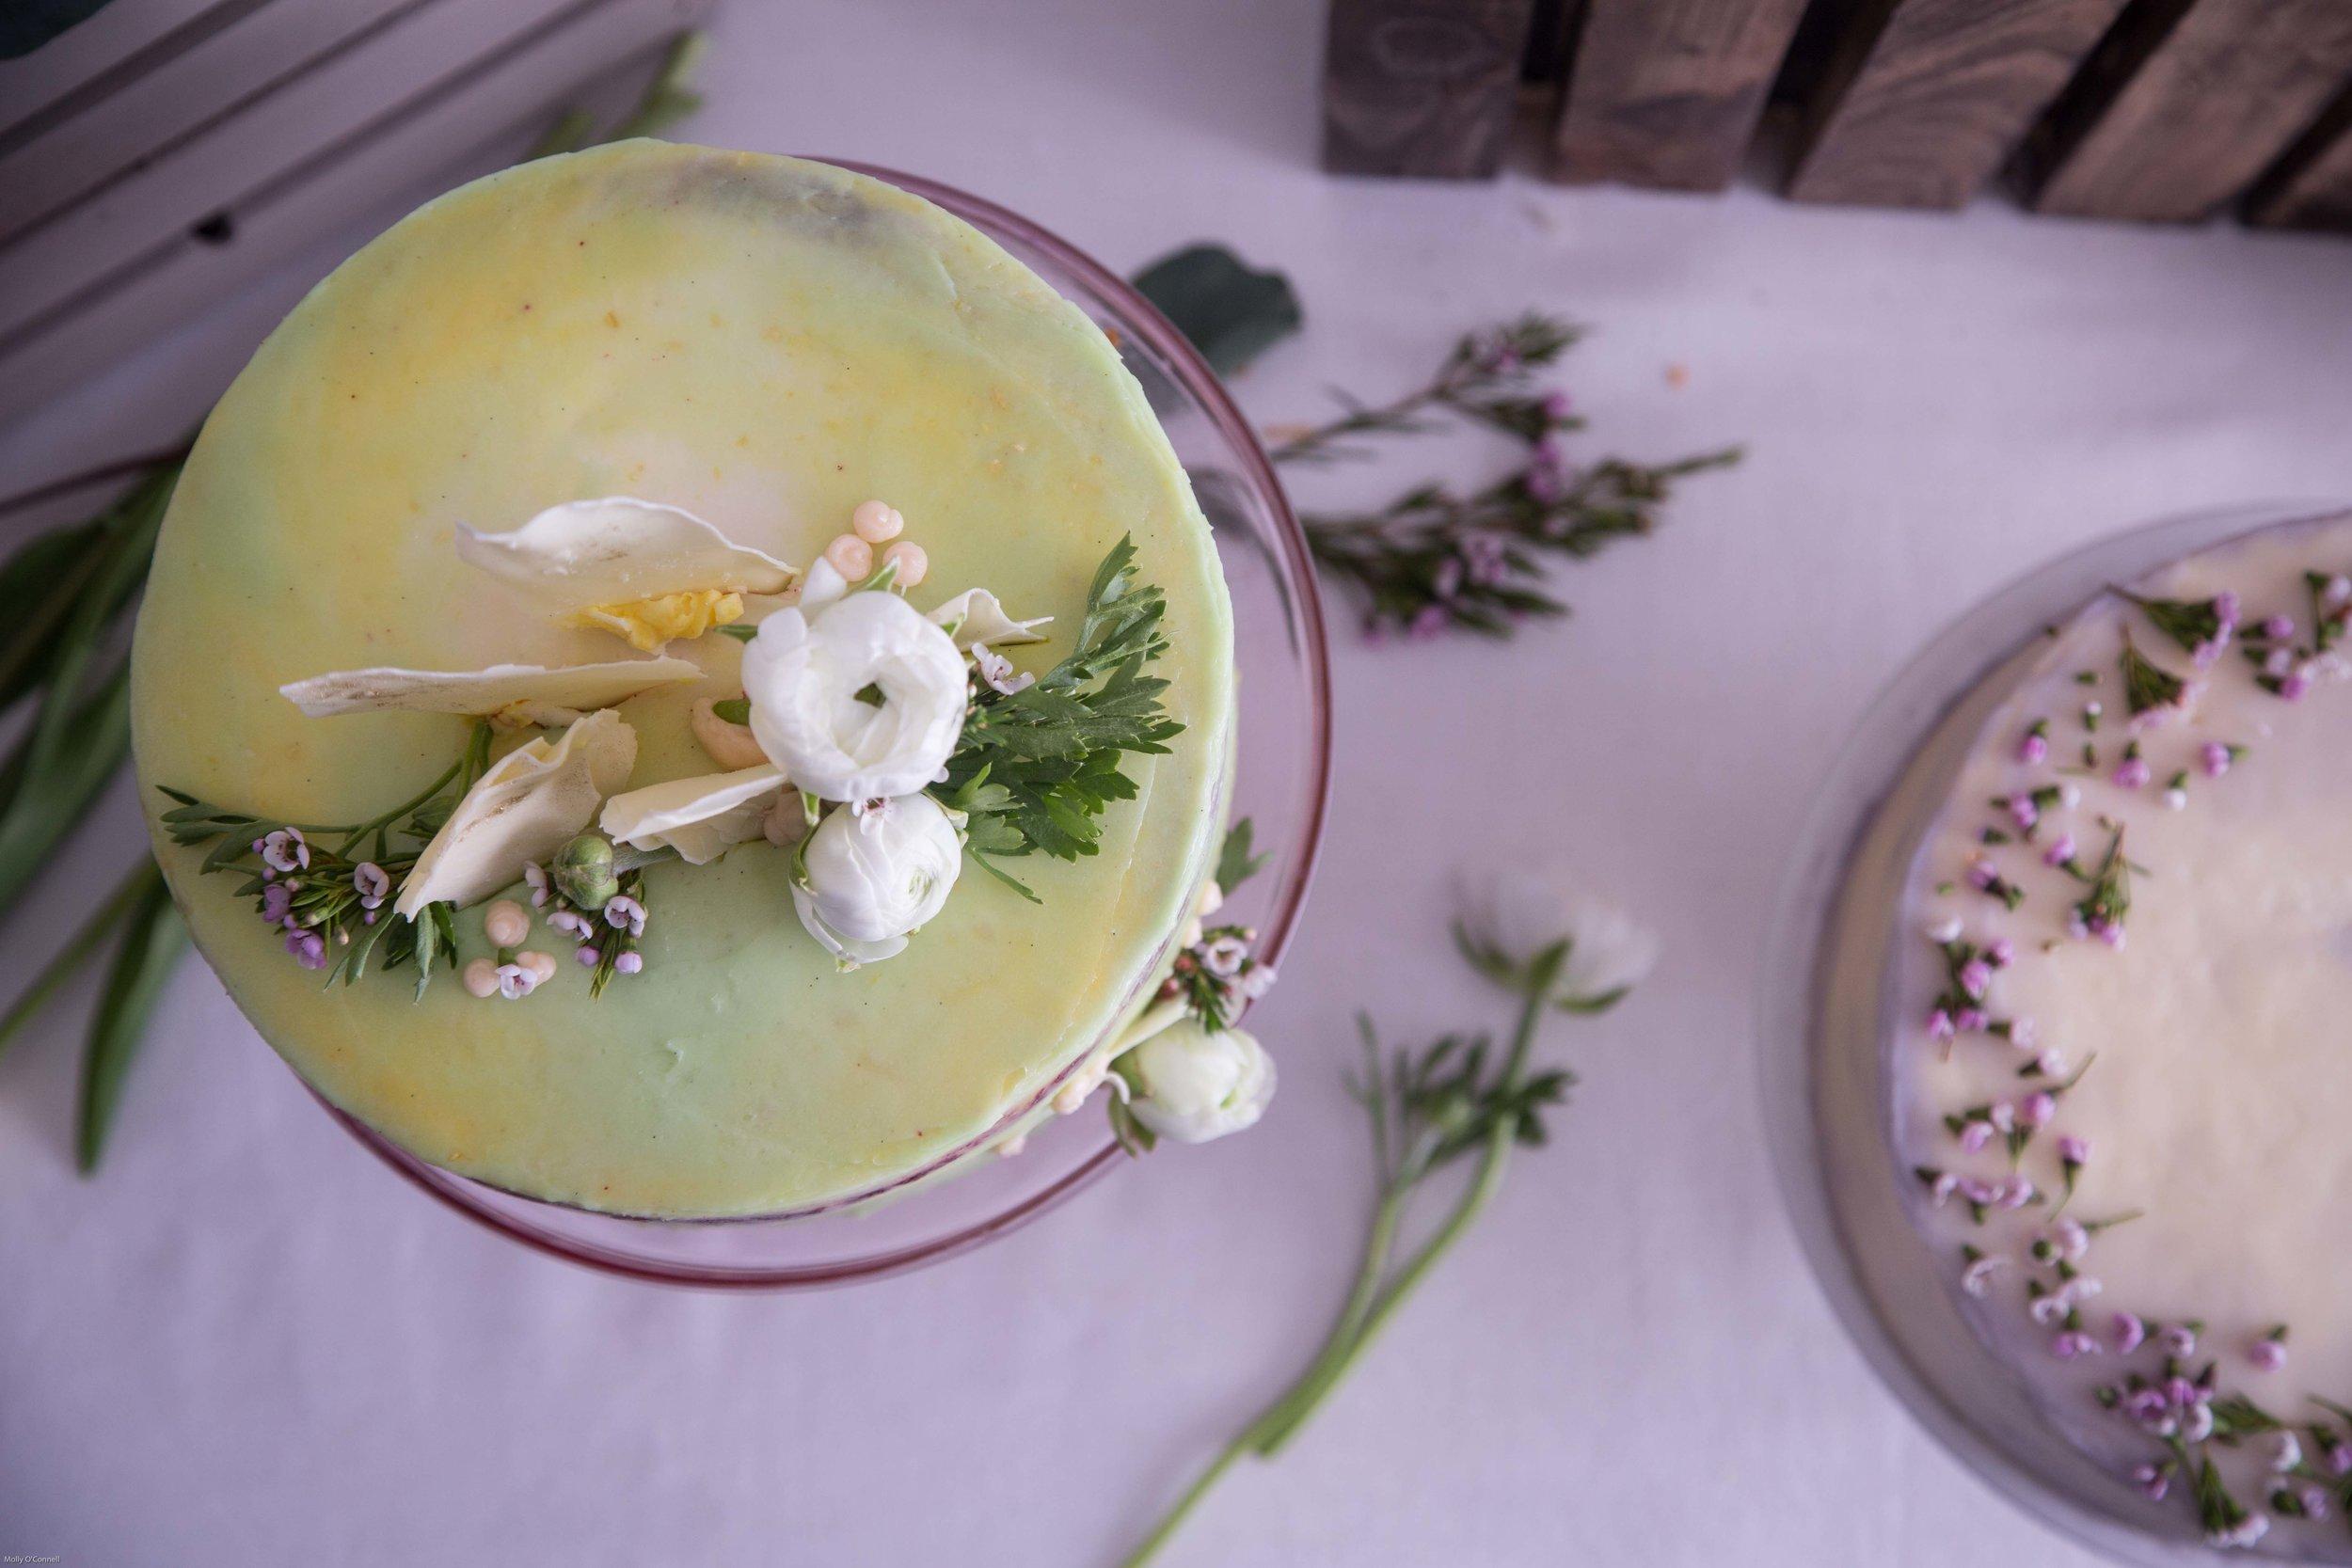 lime cake with flowers hero-3738.jpg